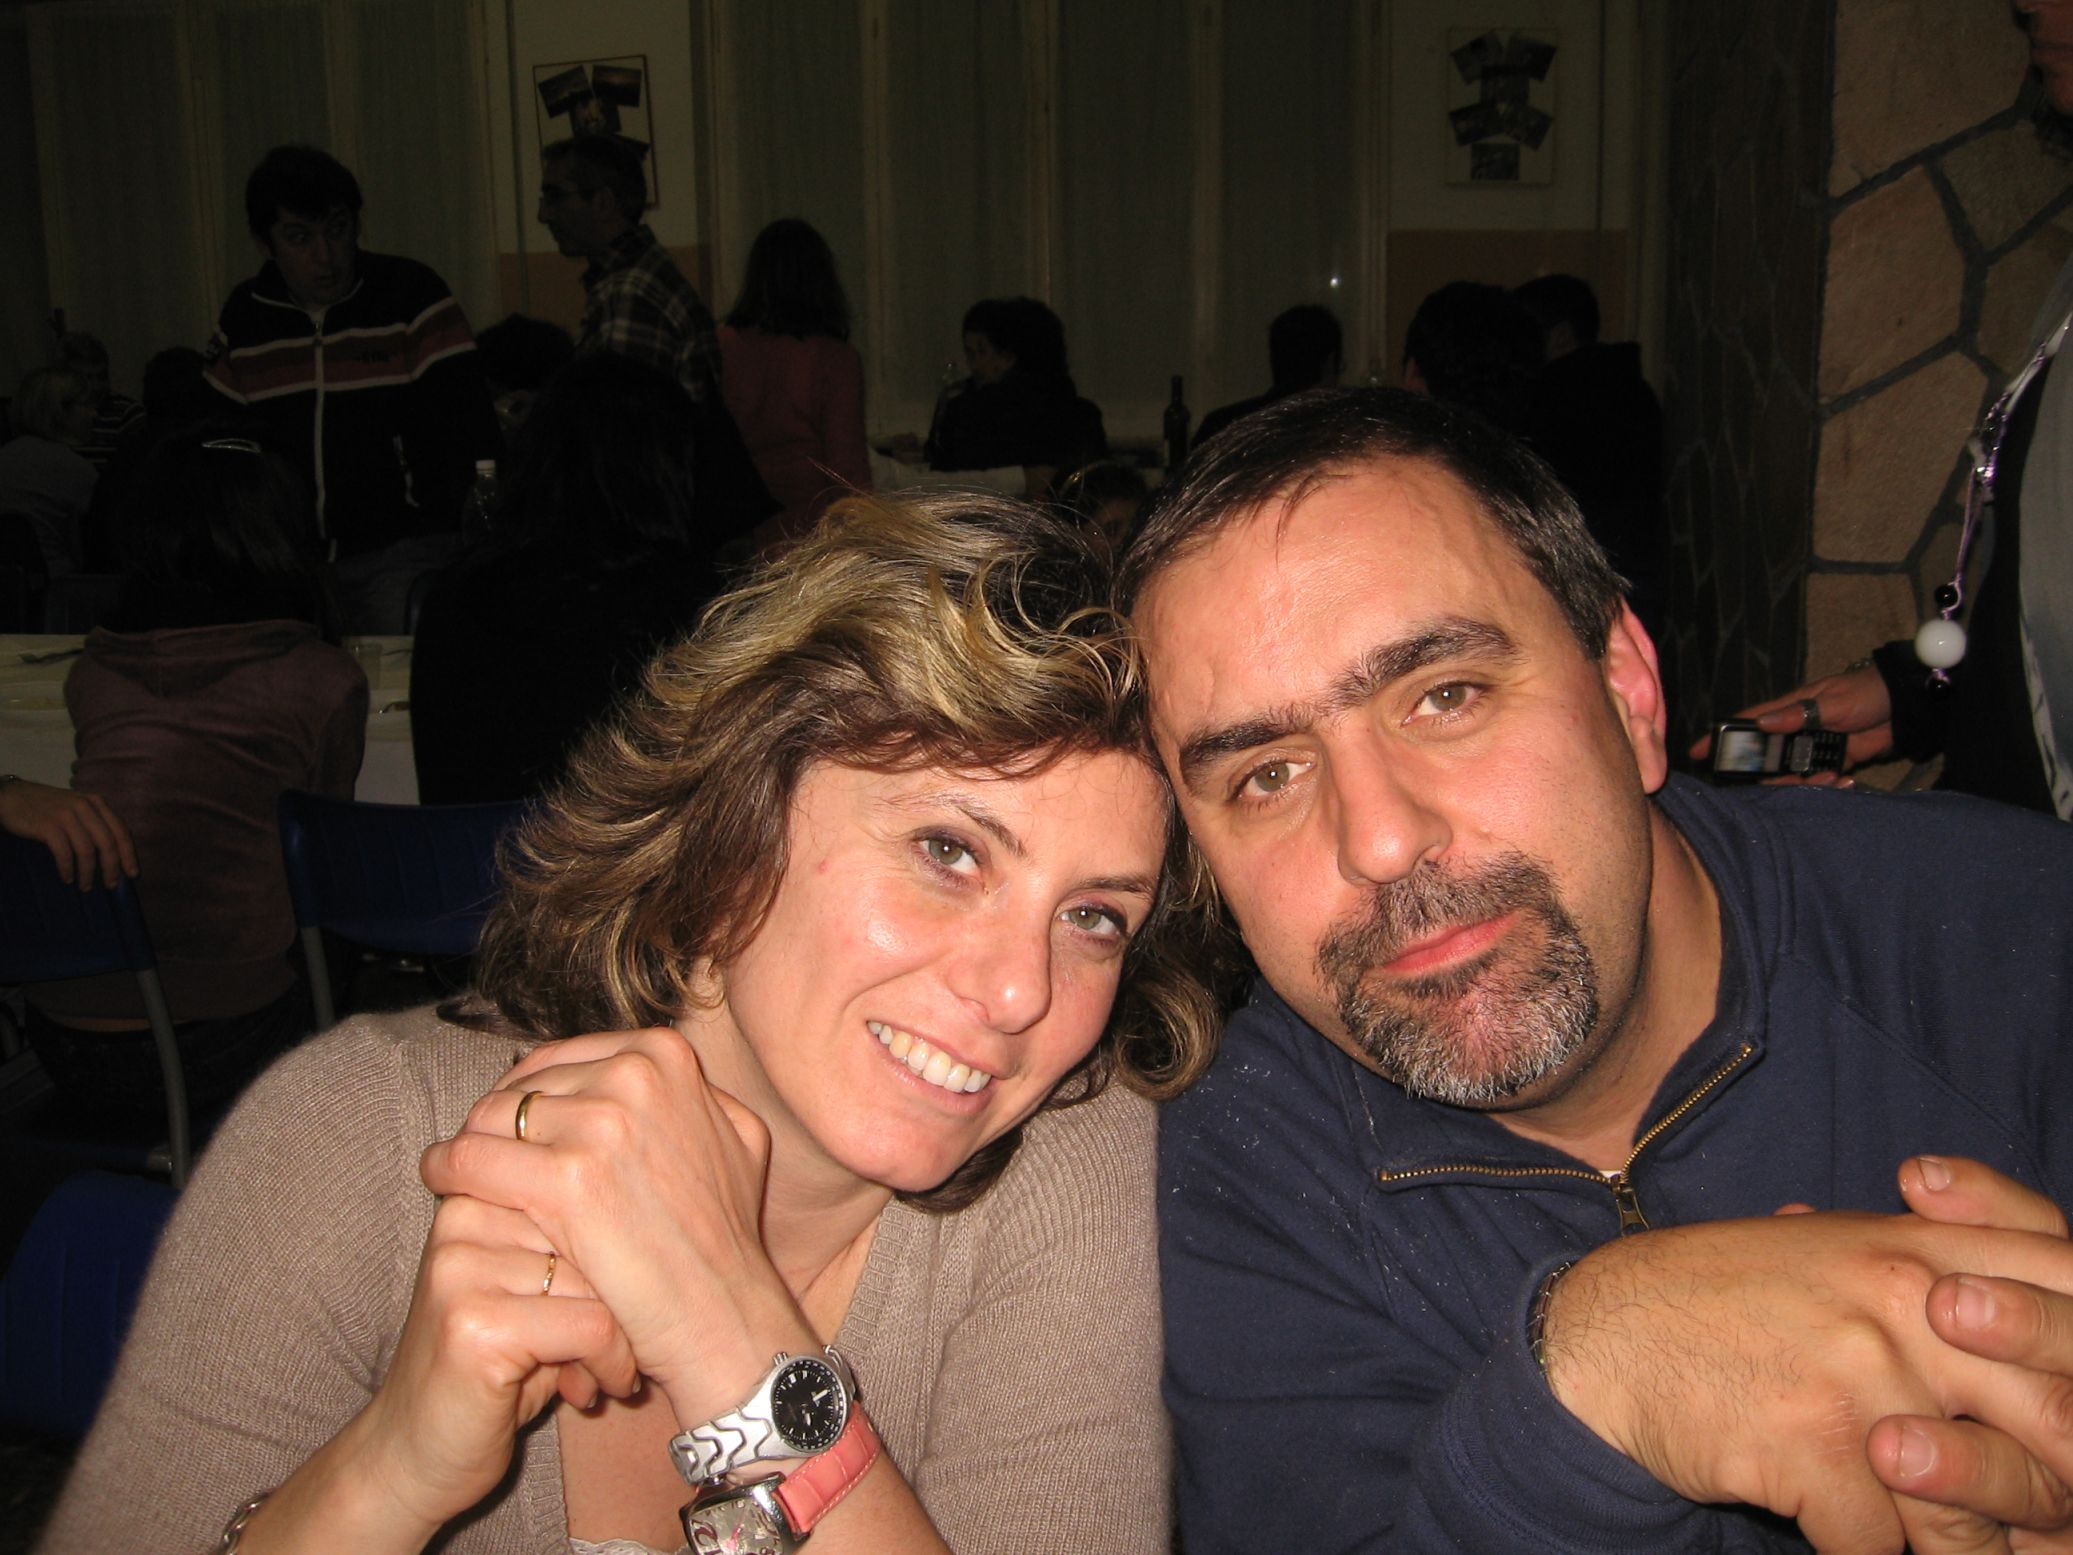 Cena_Famiglie_Giovani-2009-11-21--21.31.32